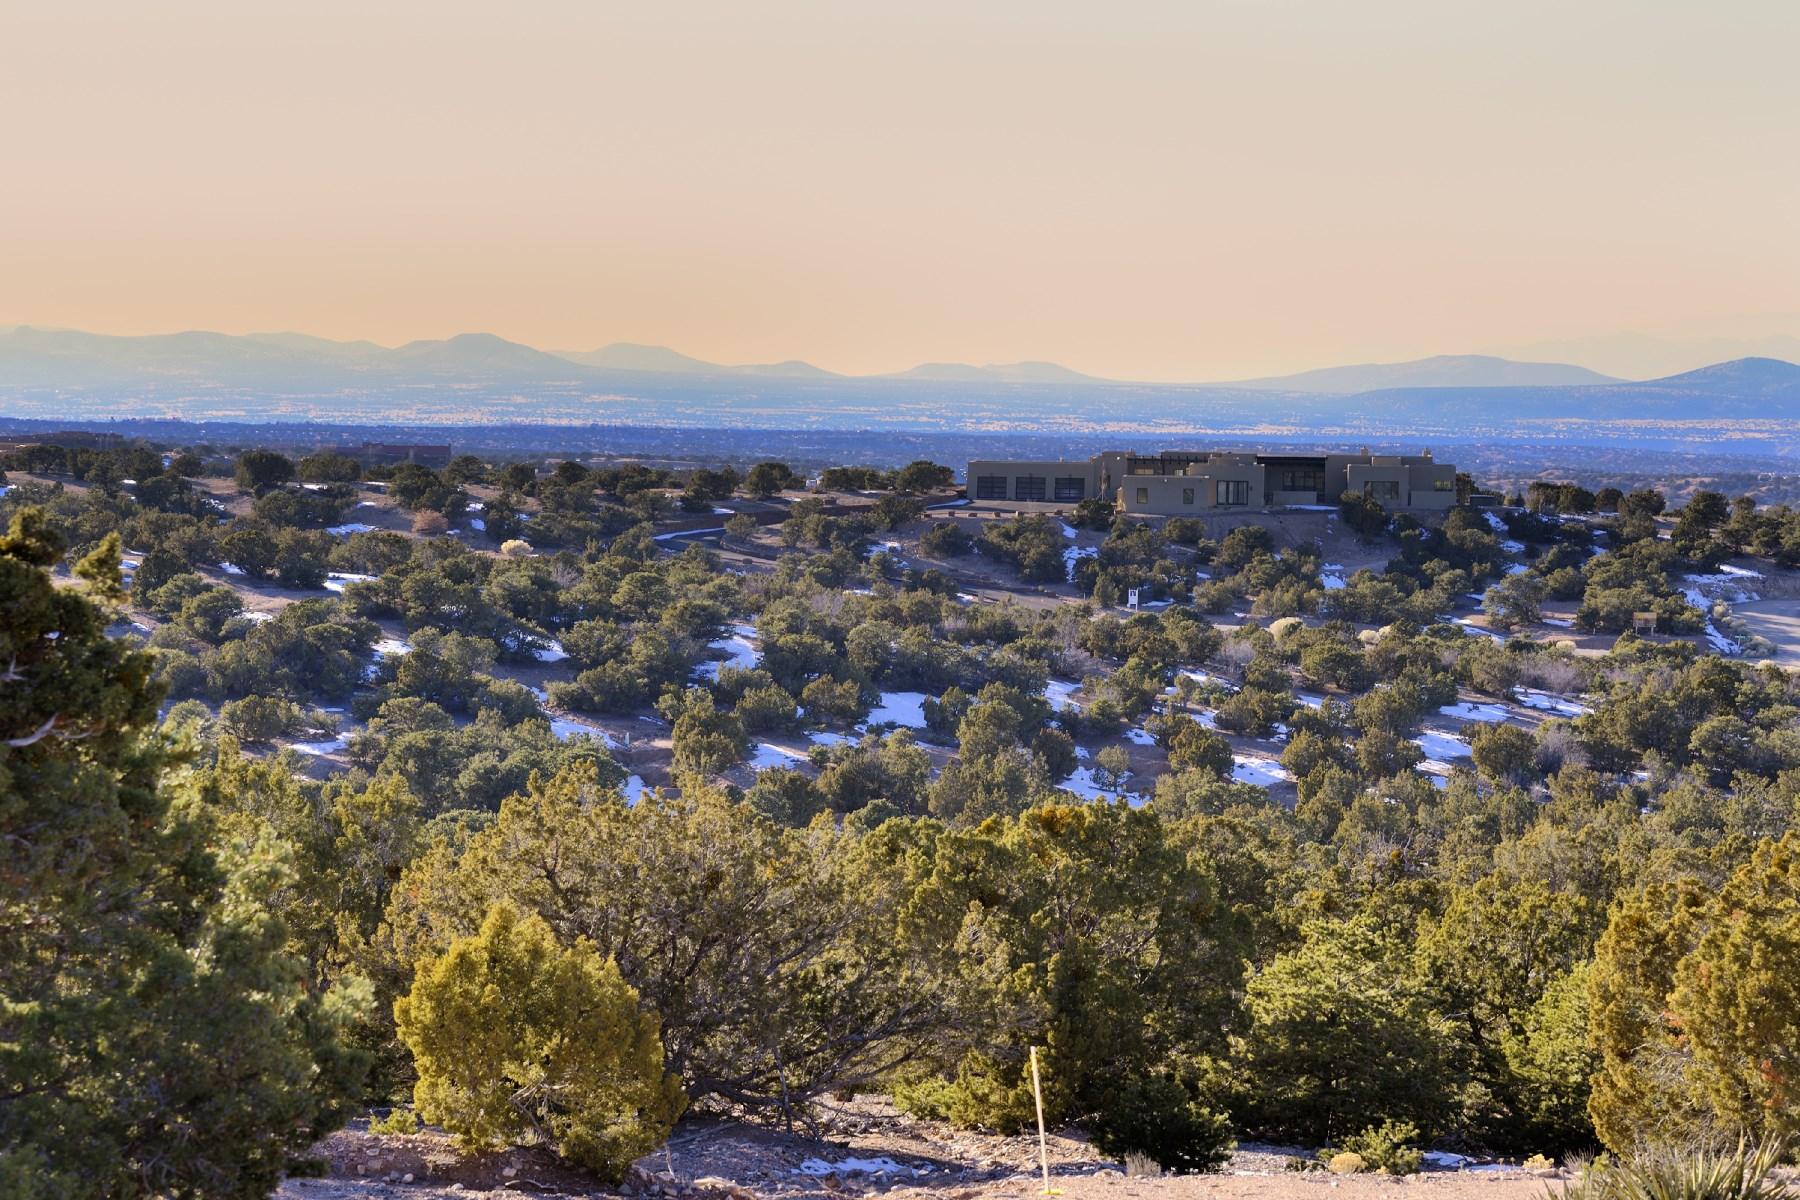 Land for Sale at 9 Sundance Ridge Lot 9 9 Sundance Ridge Circle Lot 9 Santa Fe, New Mexico 87506 United States